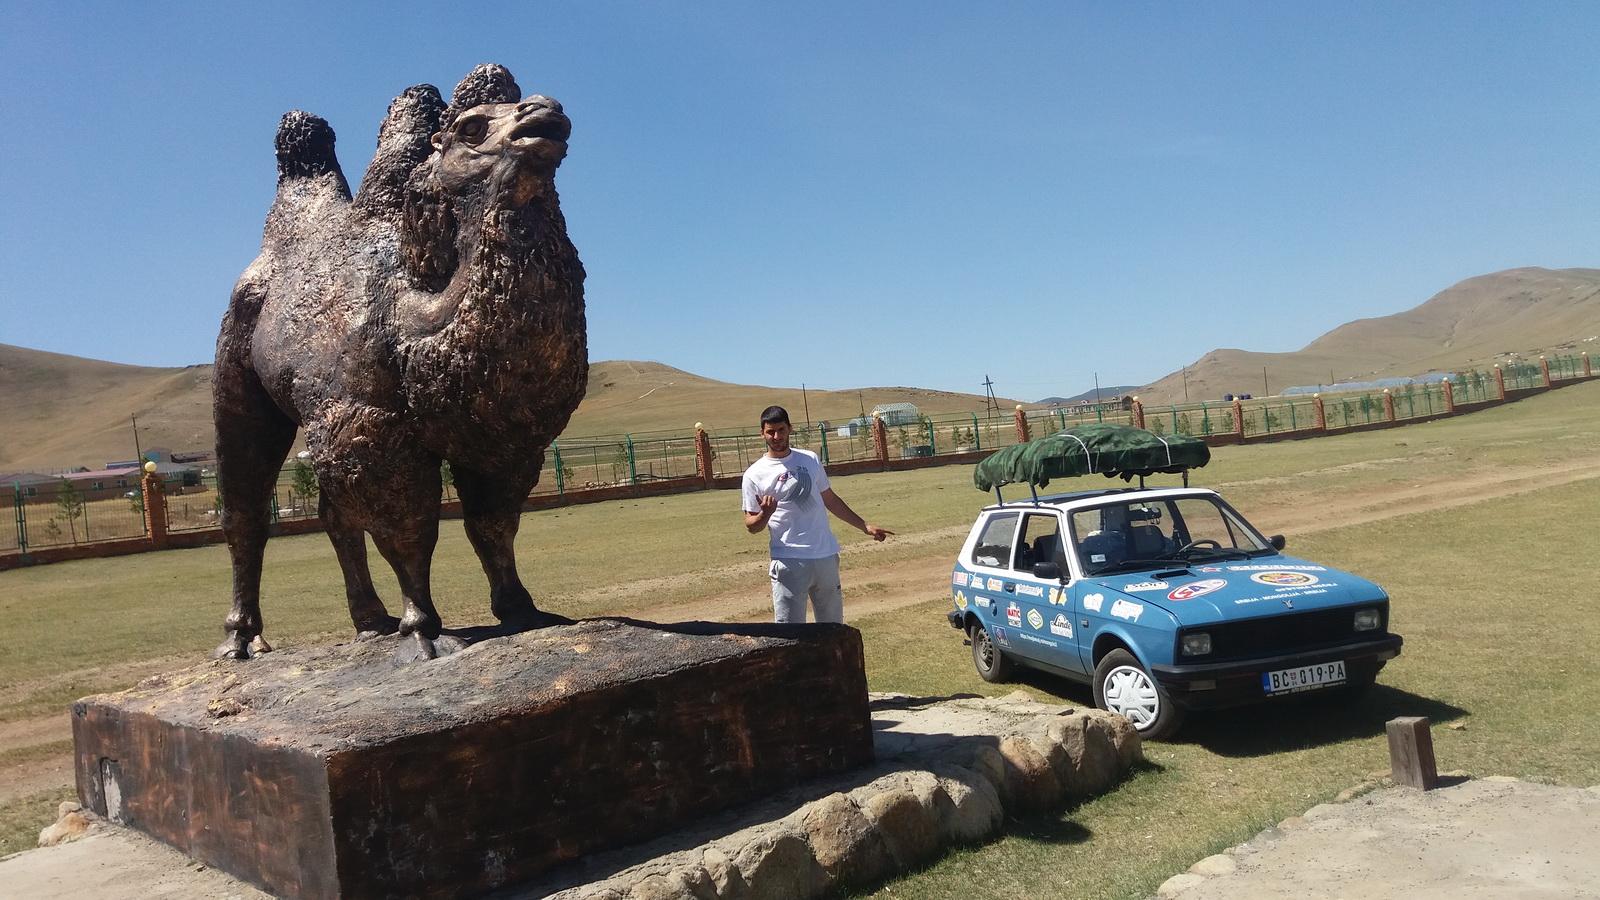 Spomenik neznanoj kamili